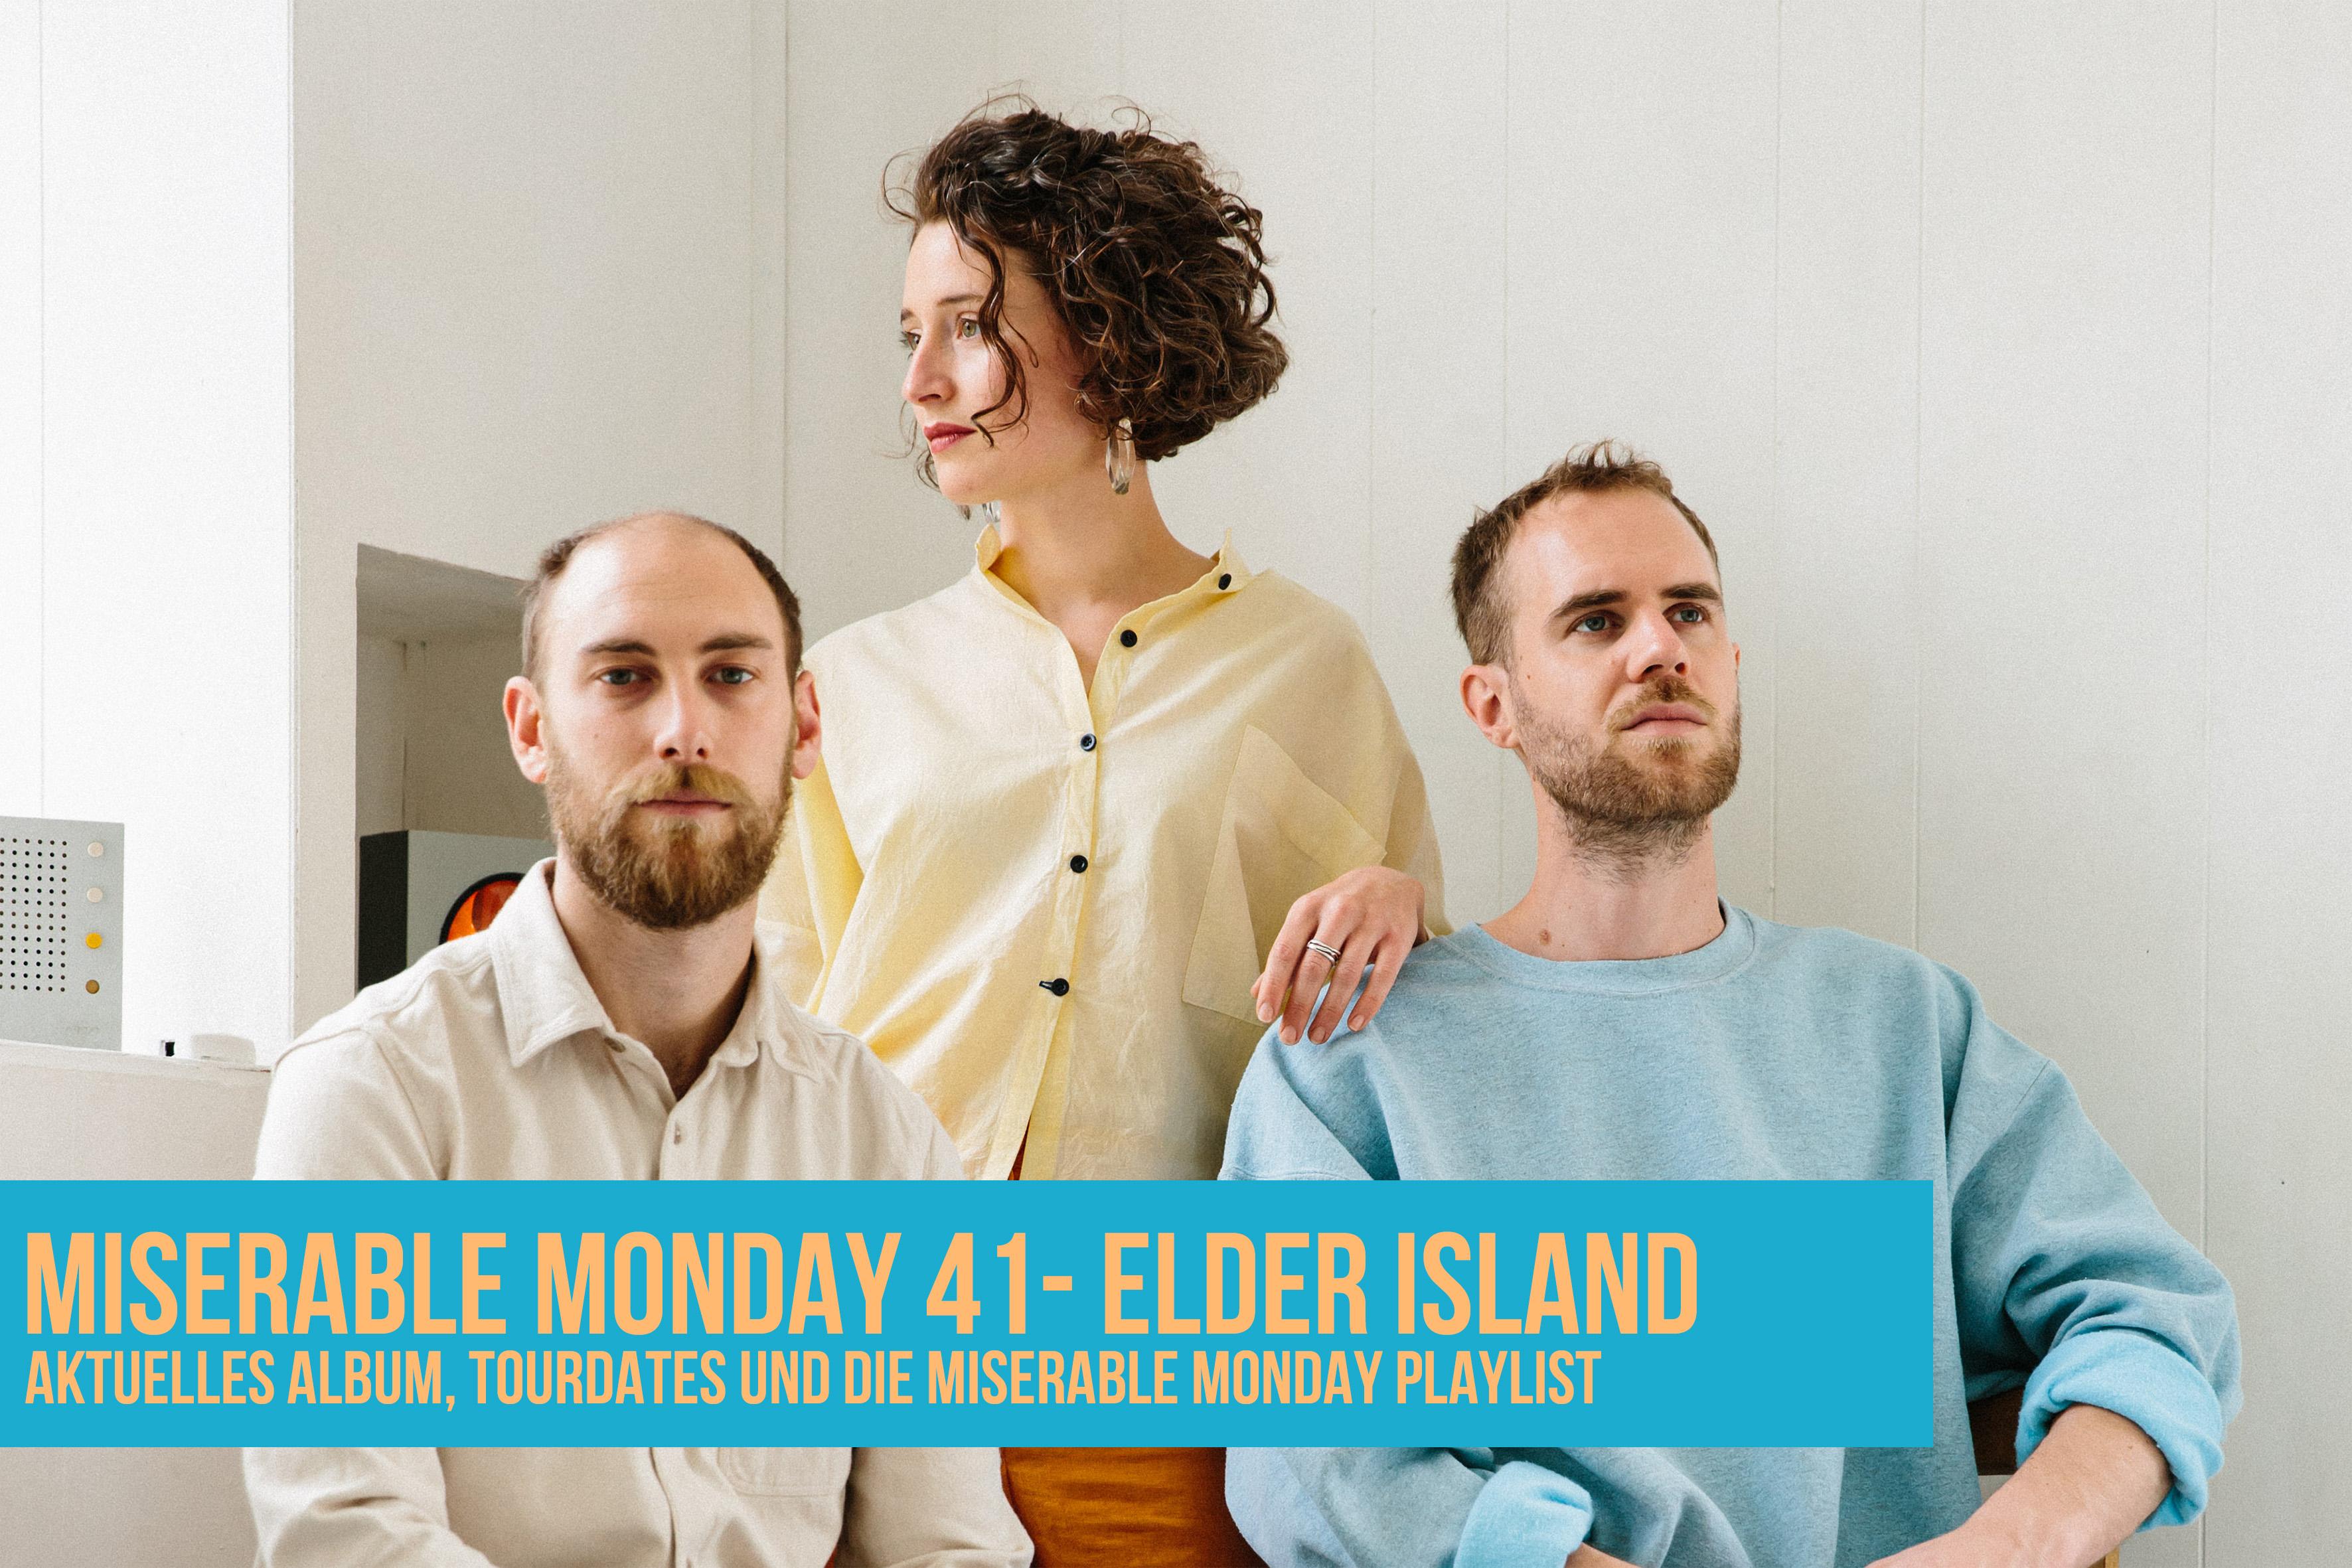 041 - Elder Island